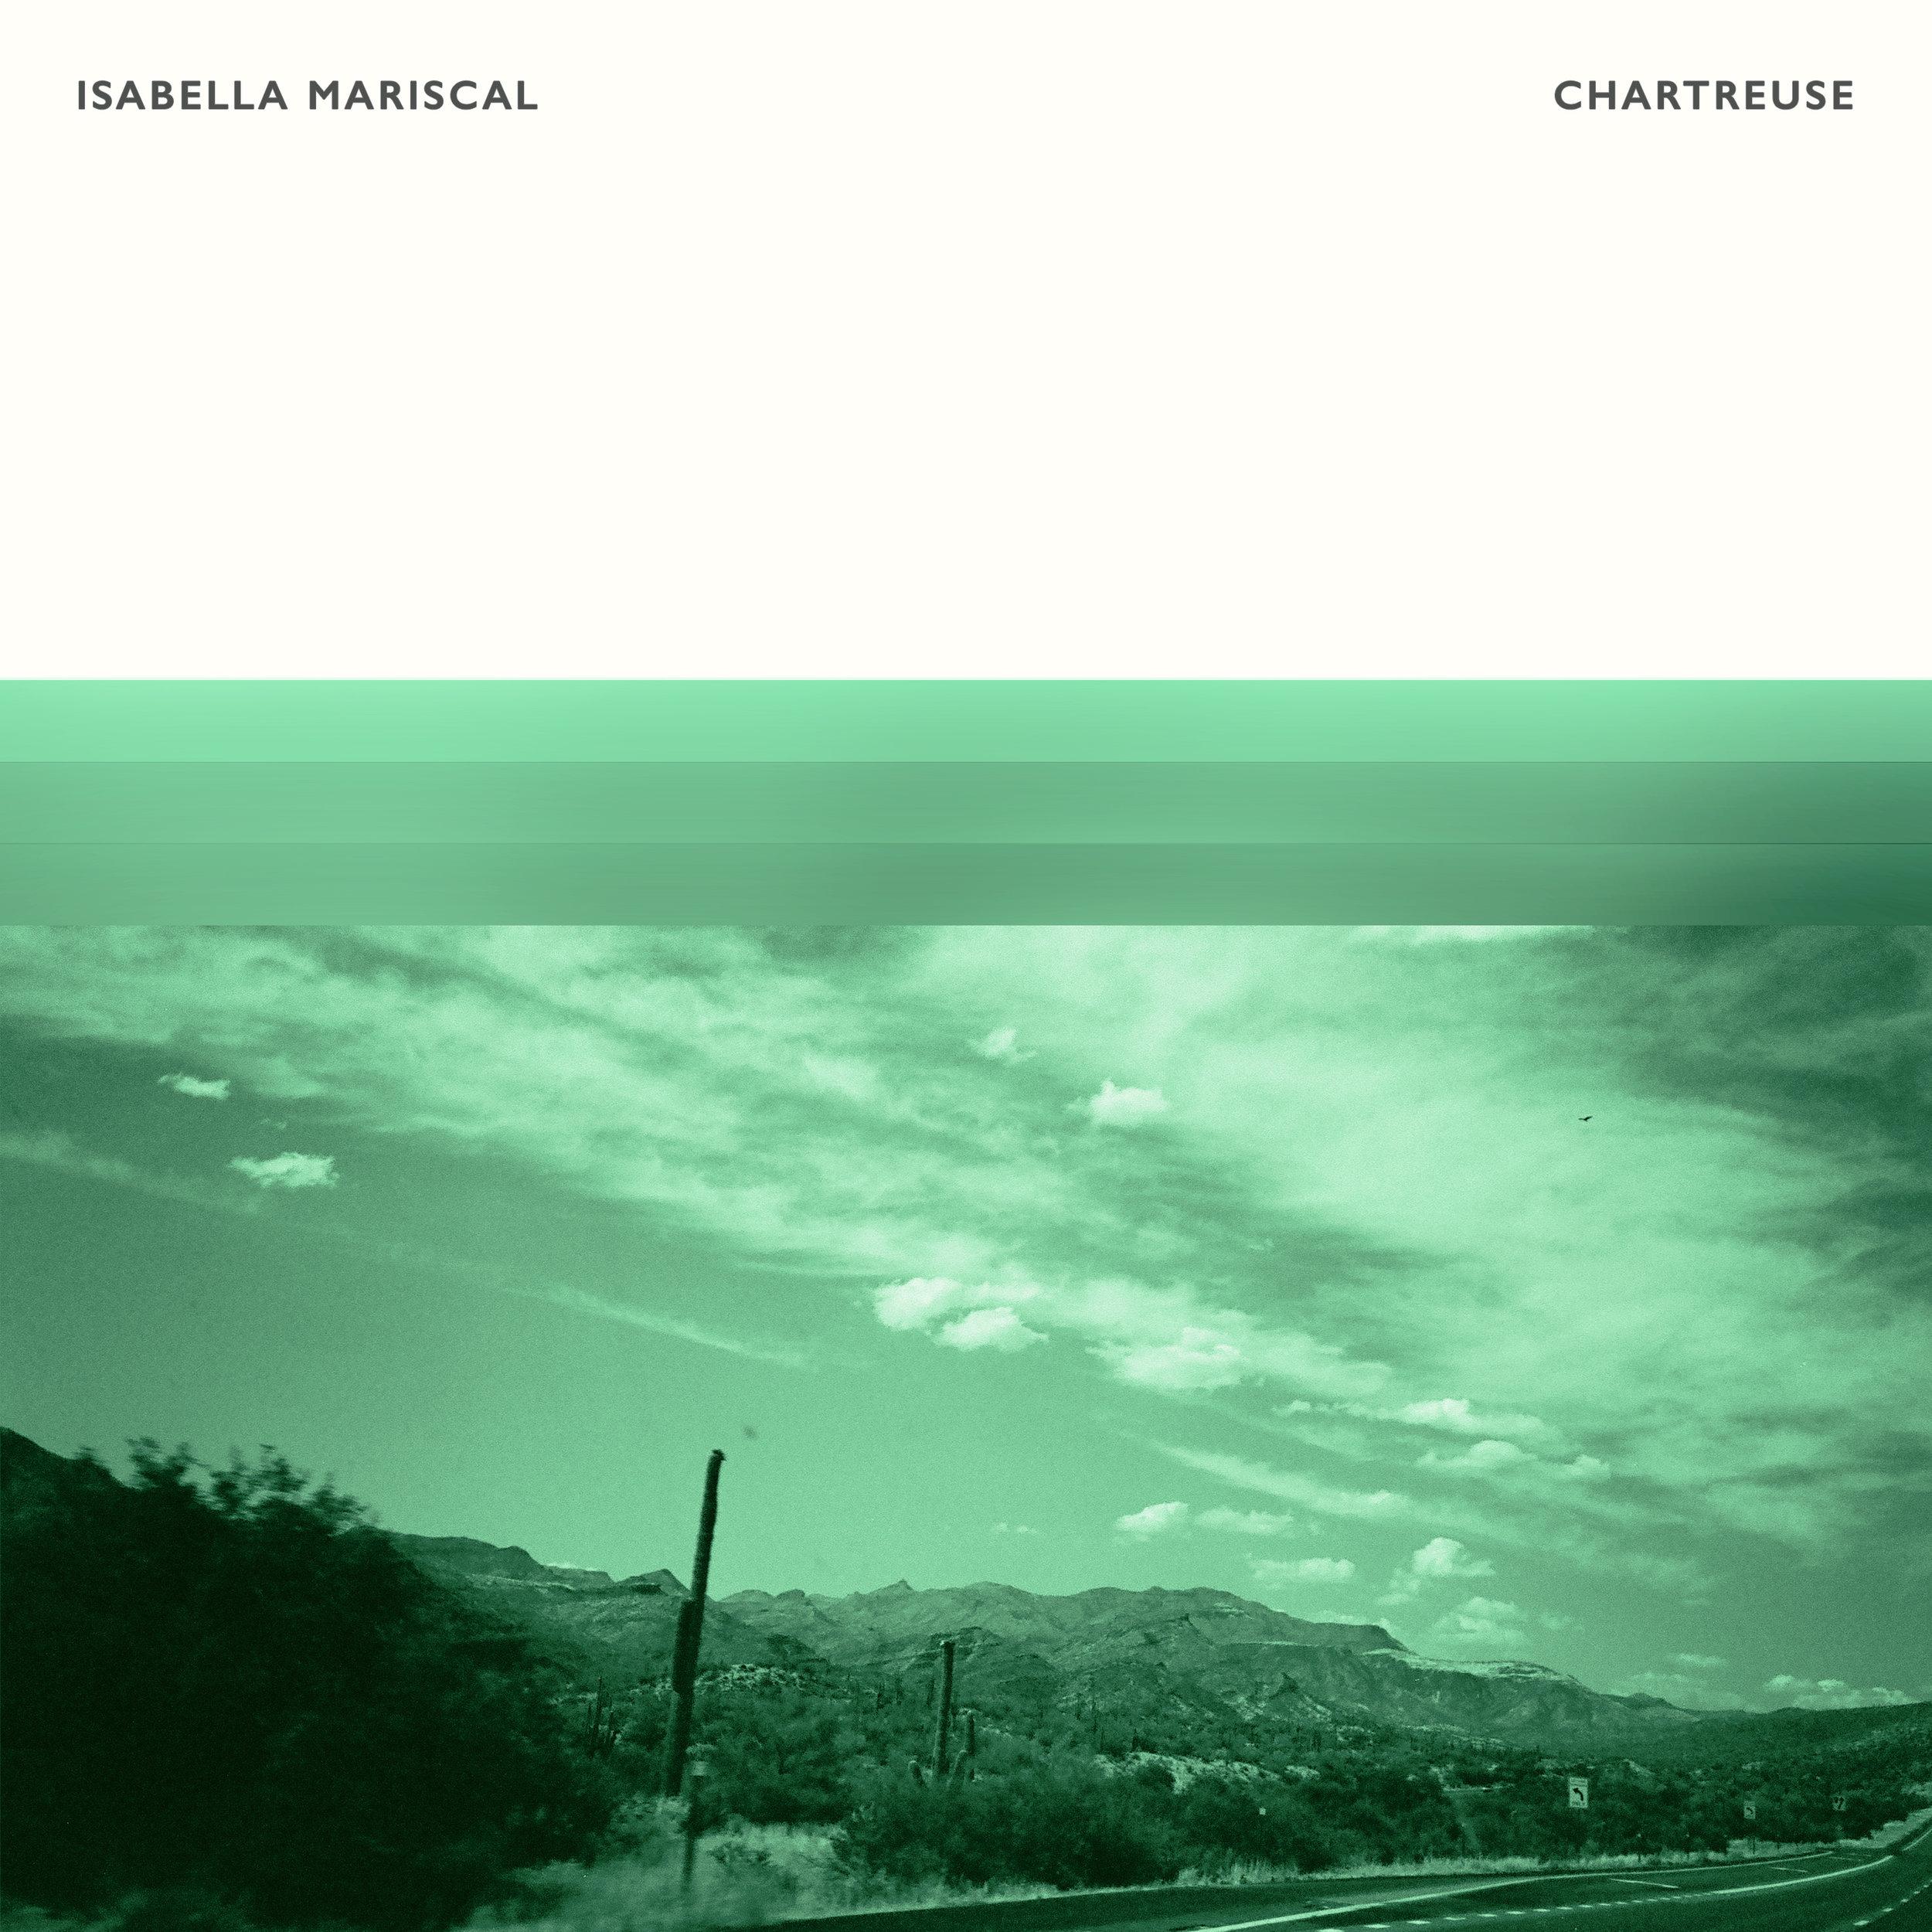 Isabella Mariscal - Chartreuse